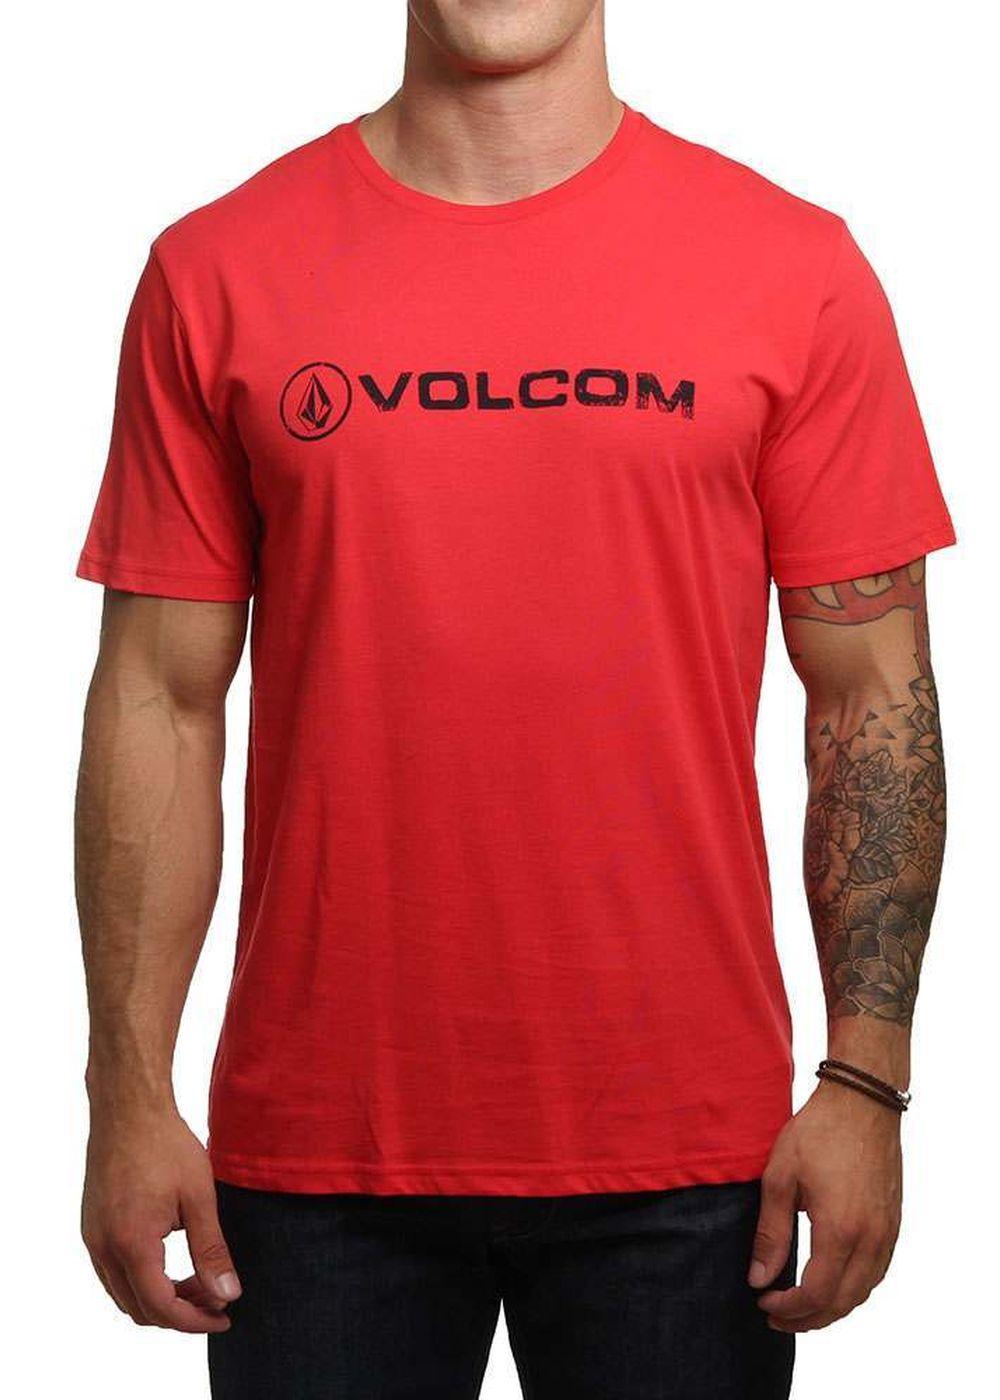 volcom-line-euro-tee-true-red